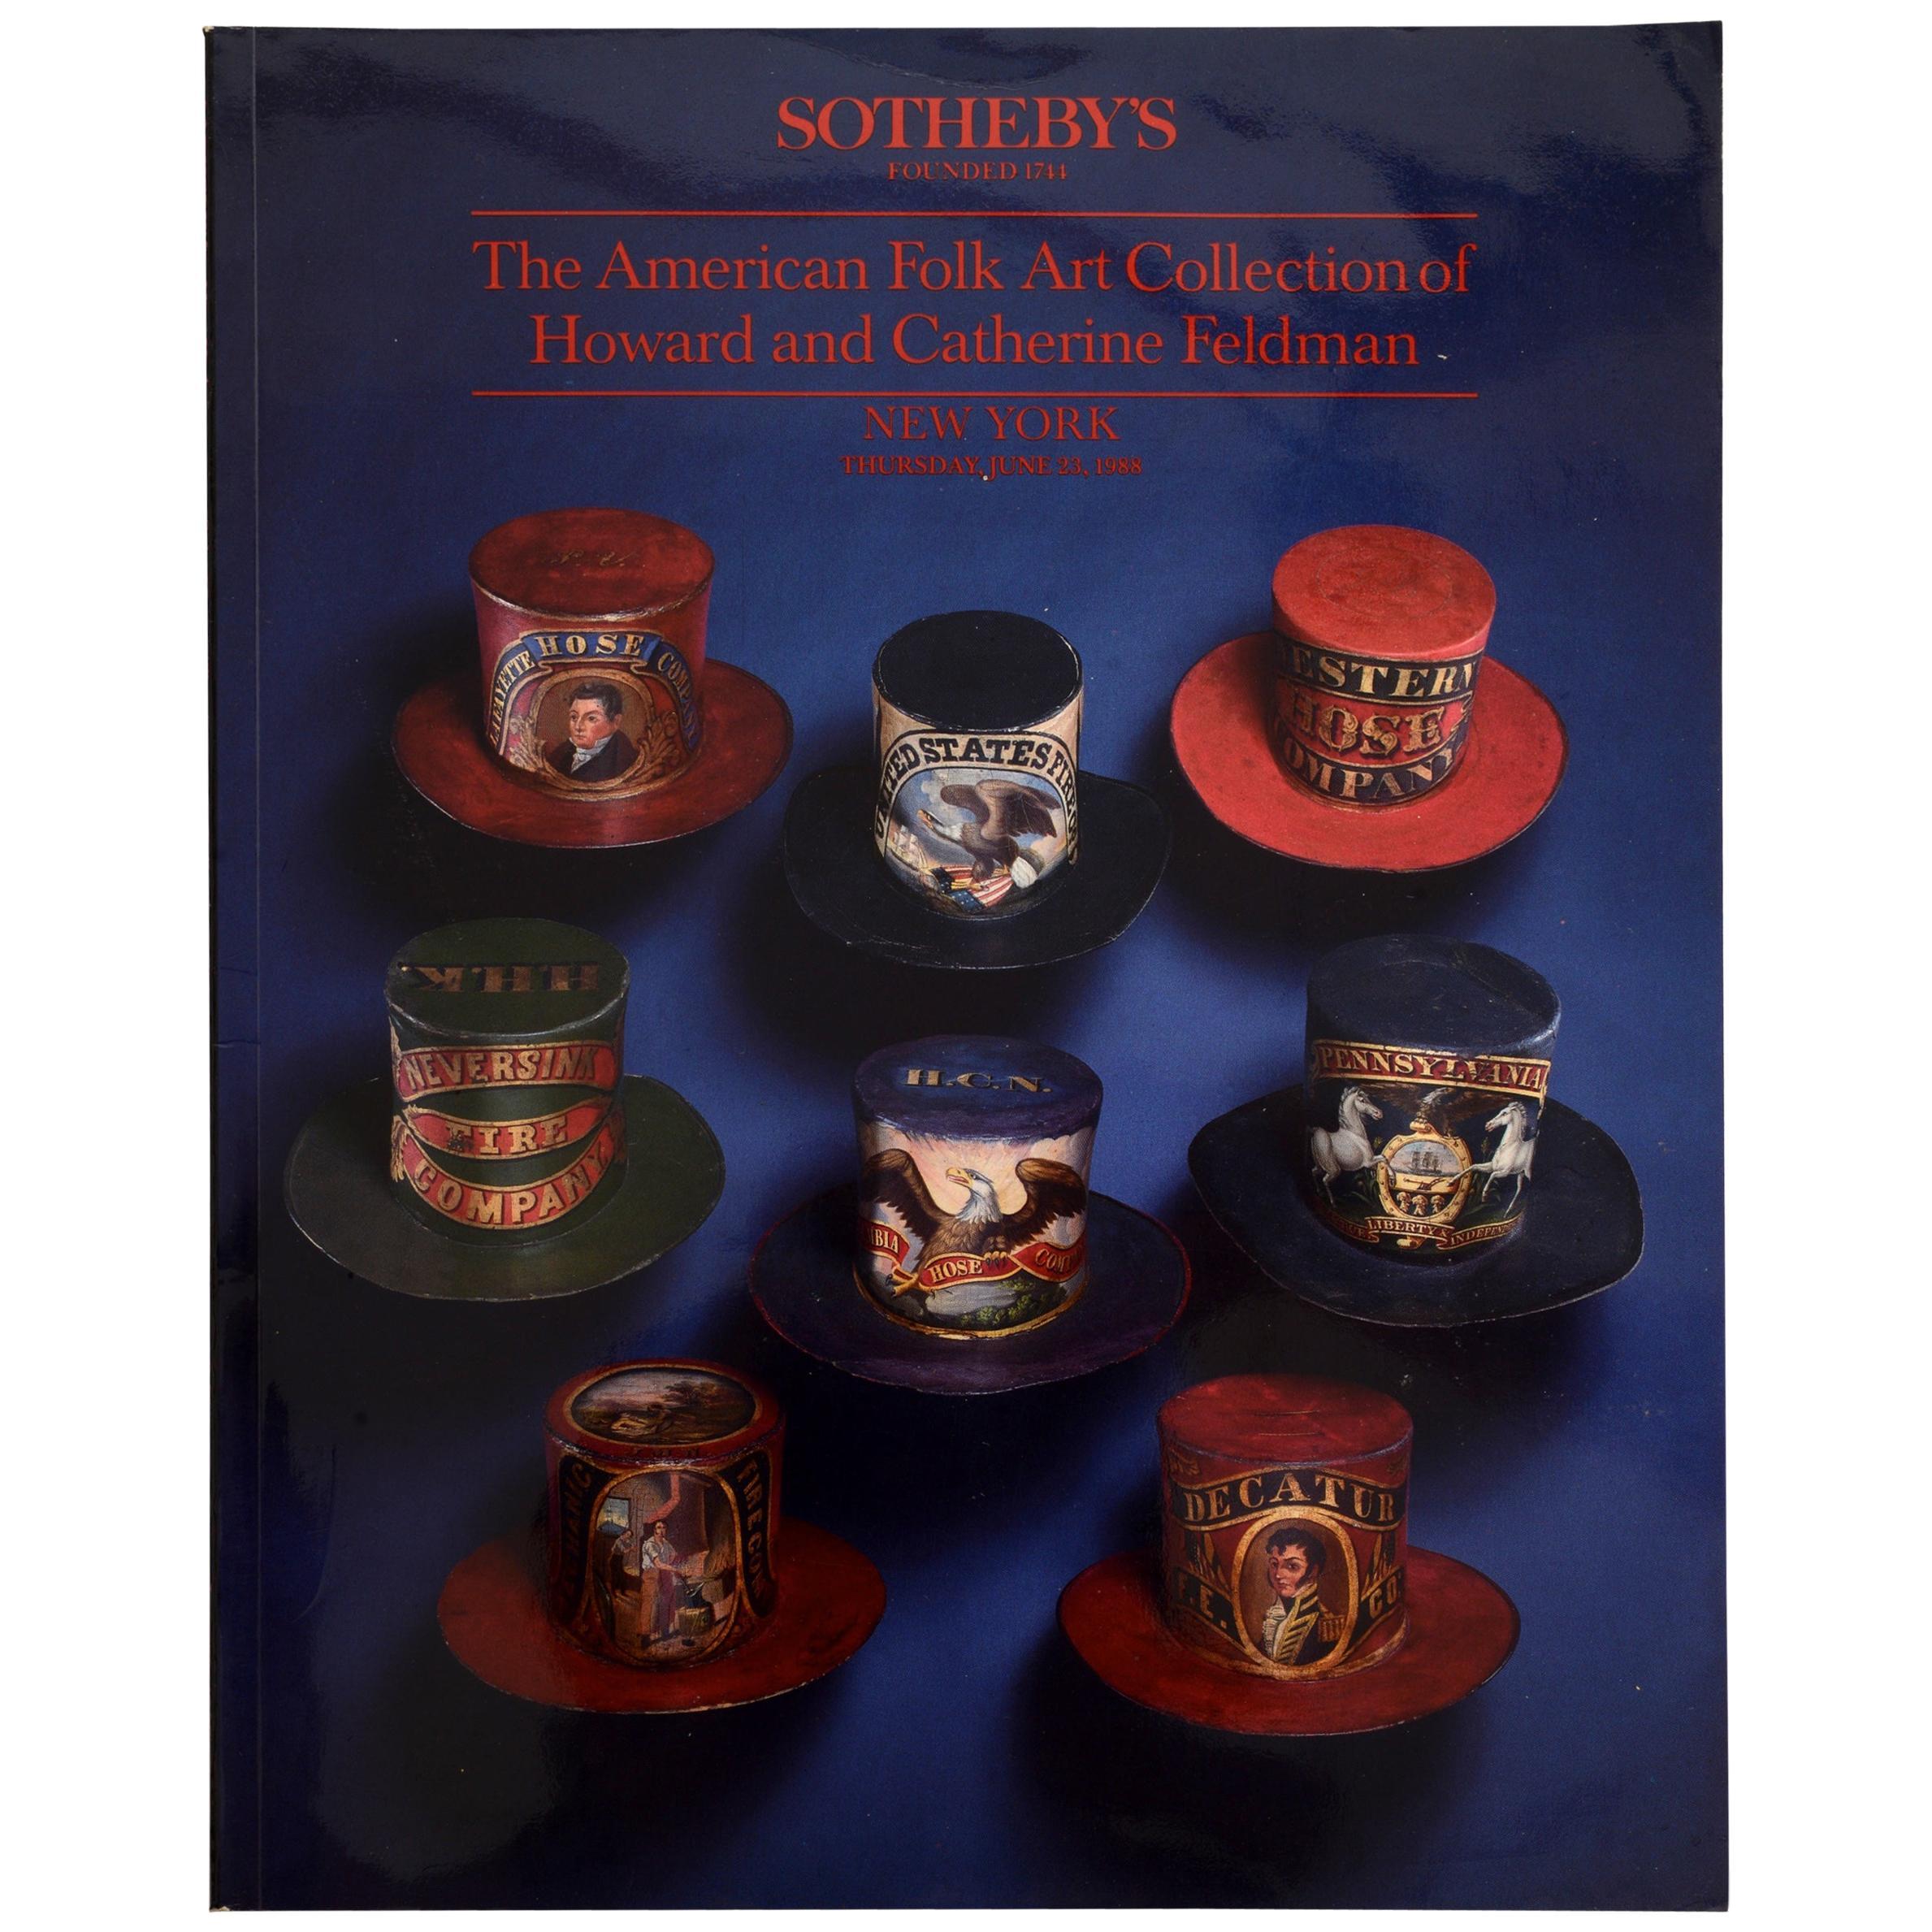 American Folk Art Collection of Howard & Catherine Feldman, Sotheby's 1st Ed